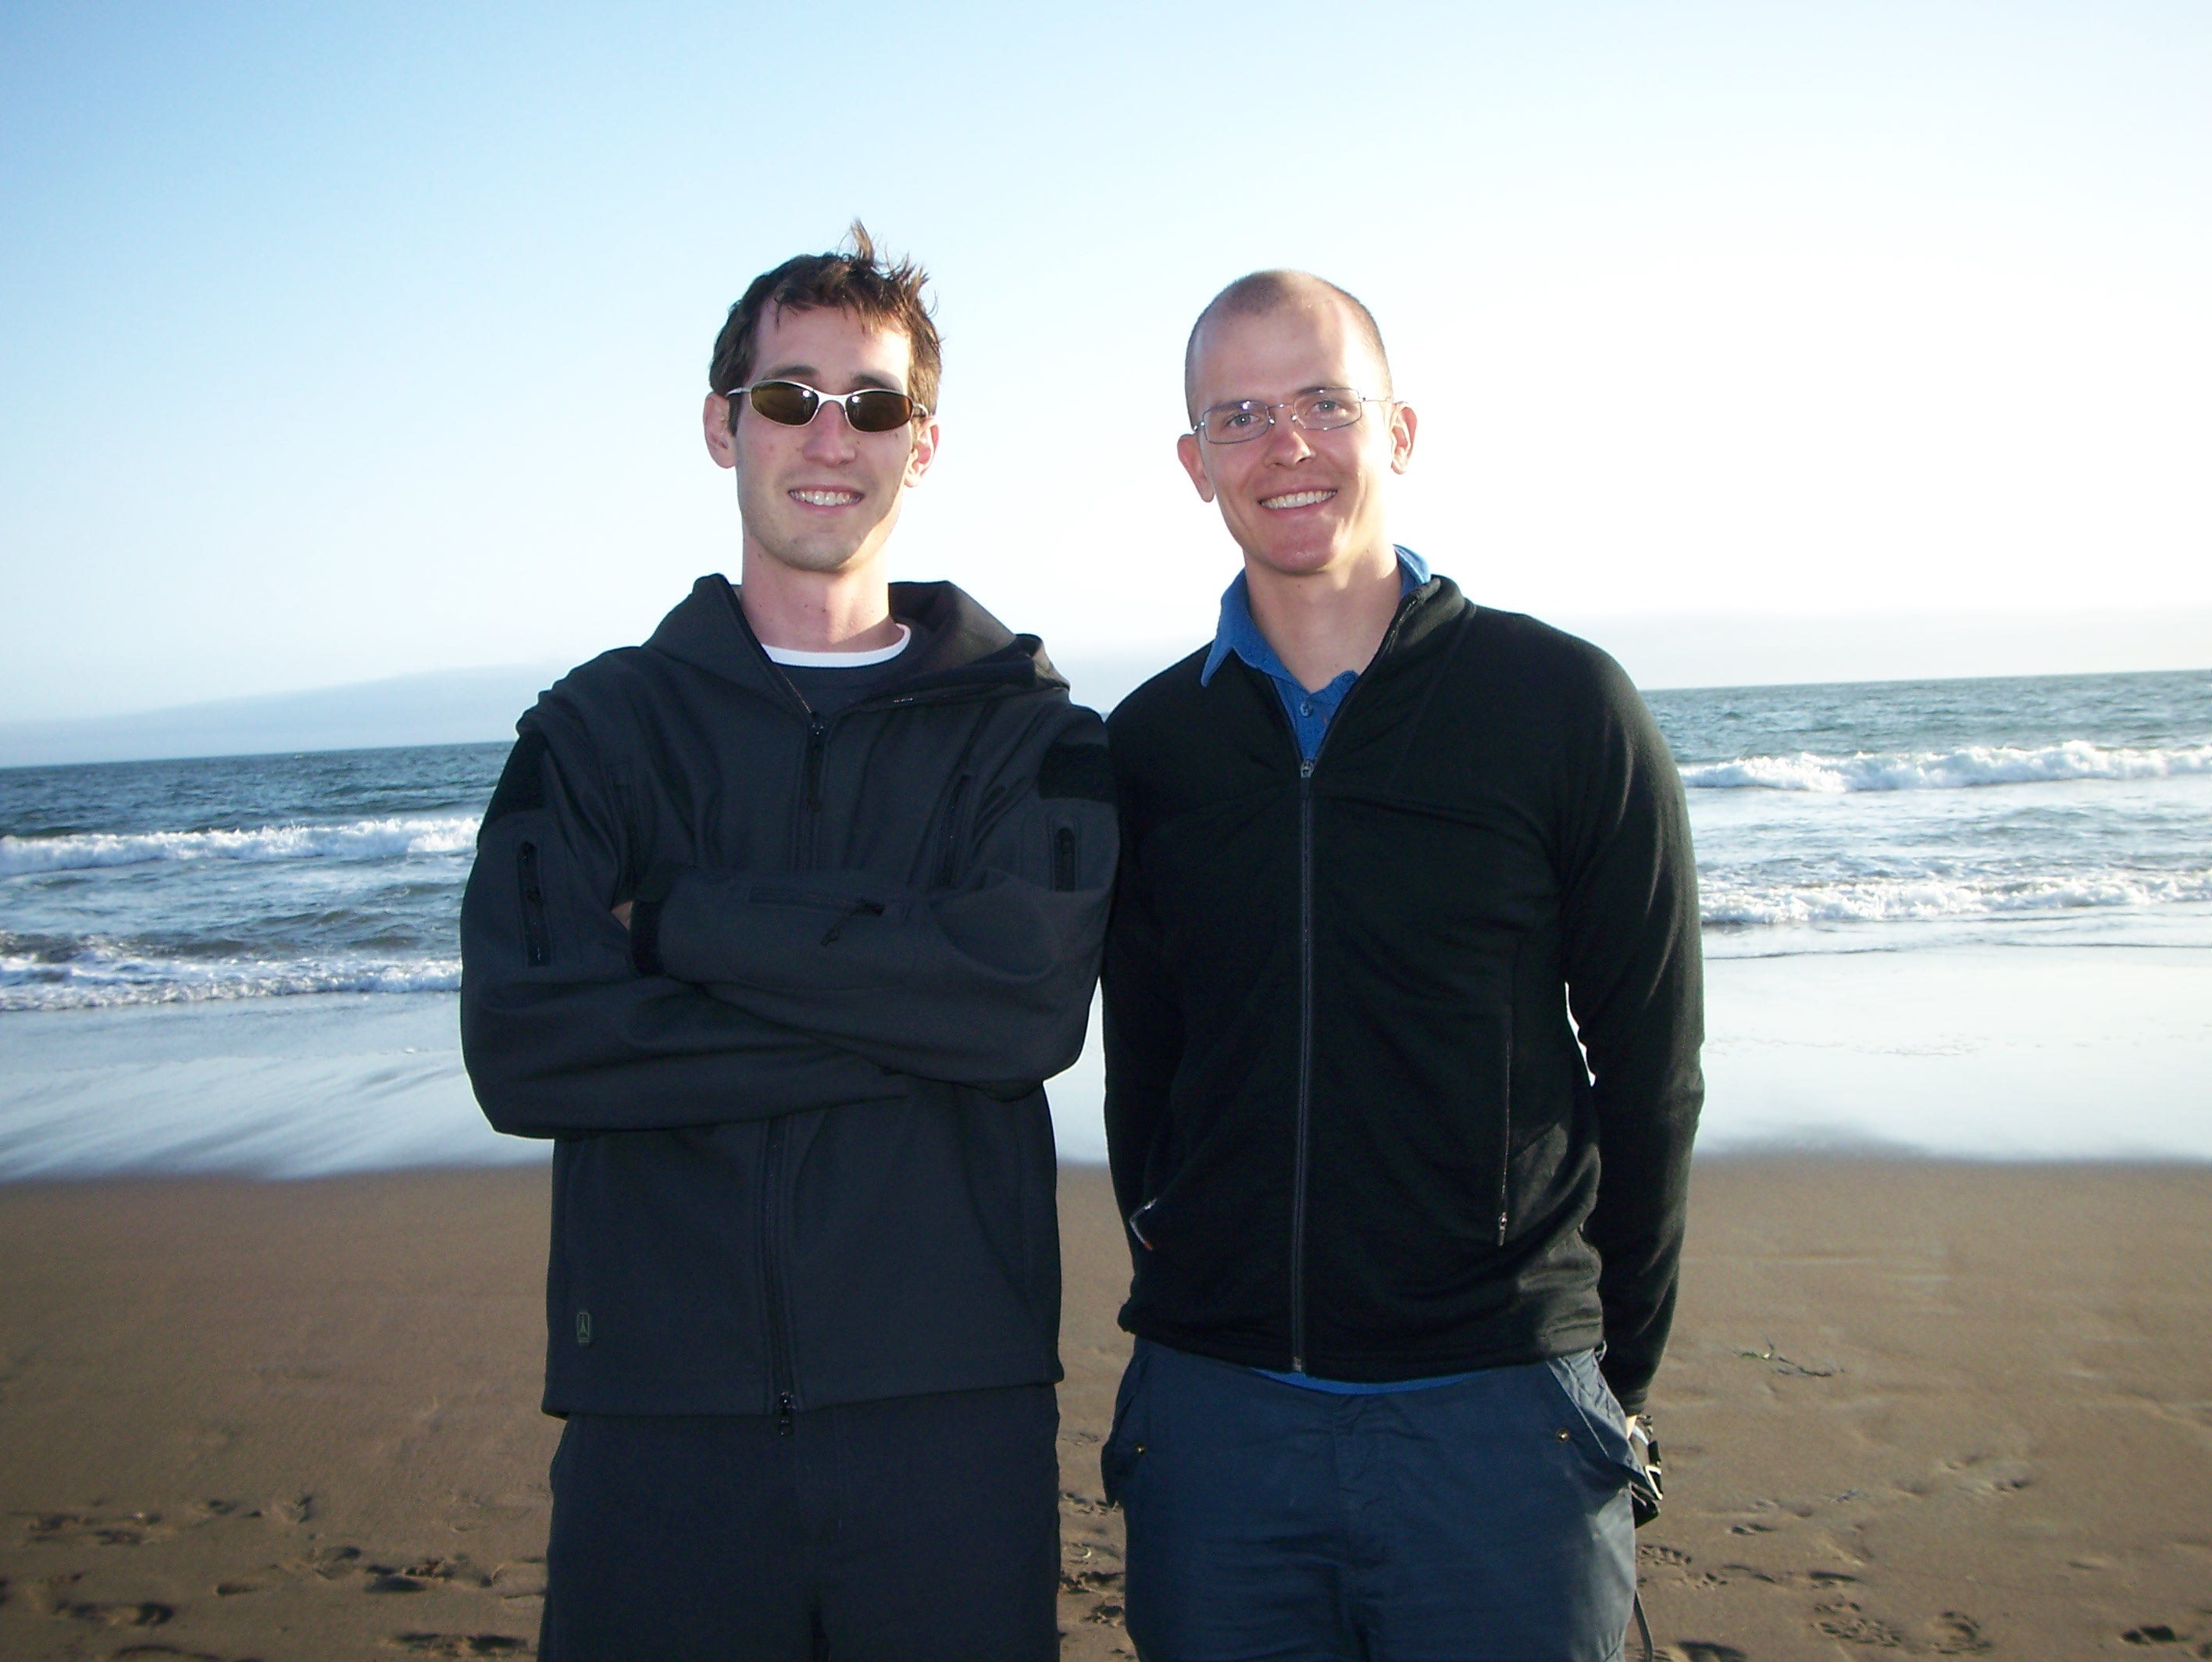 Me and DK at Stinson Beach